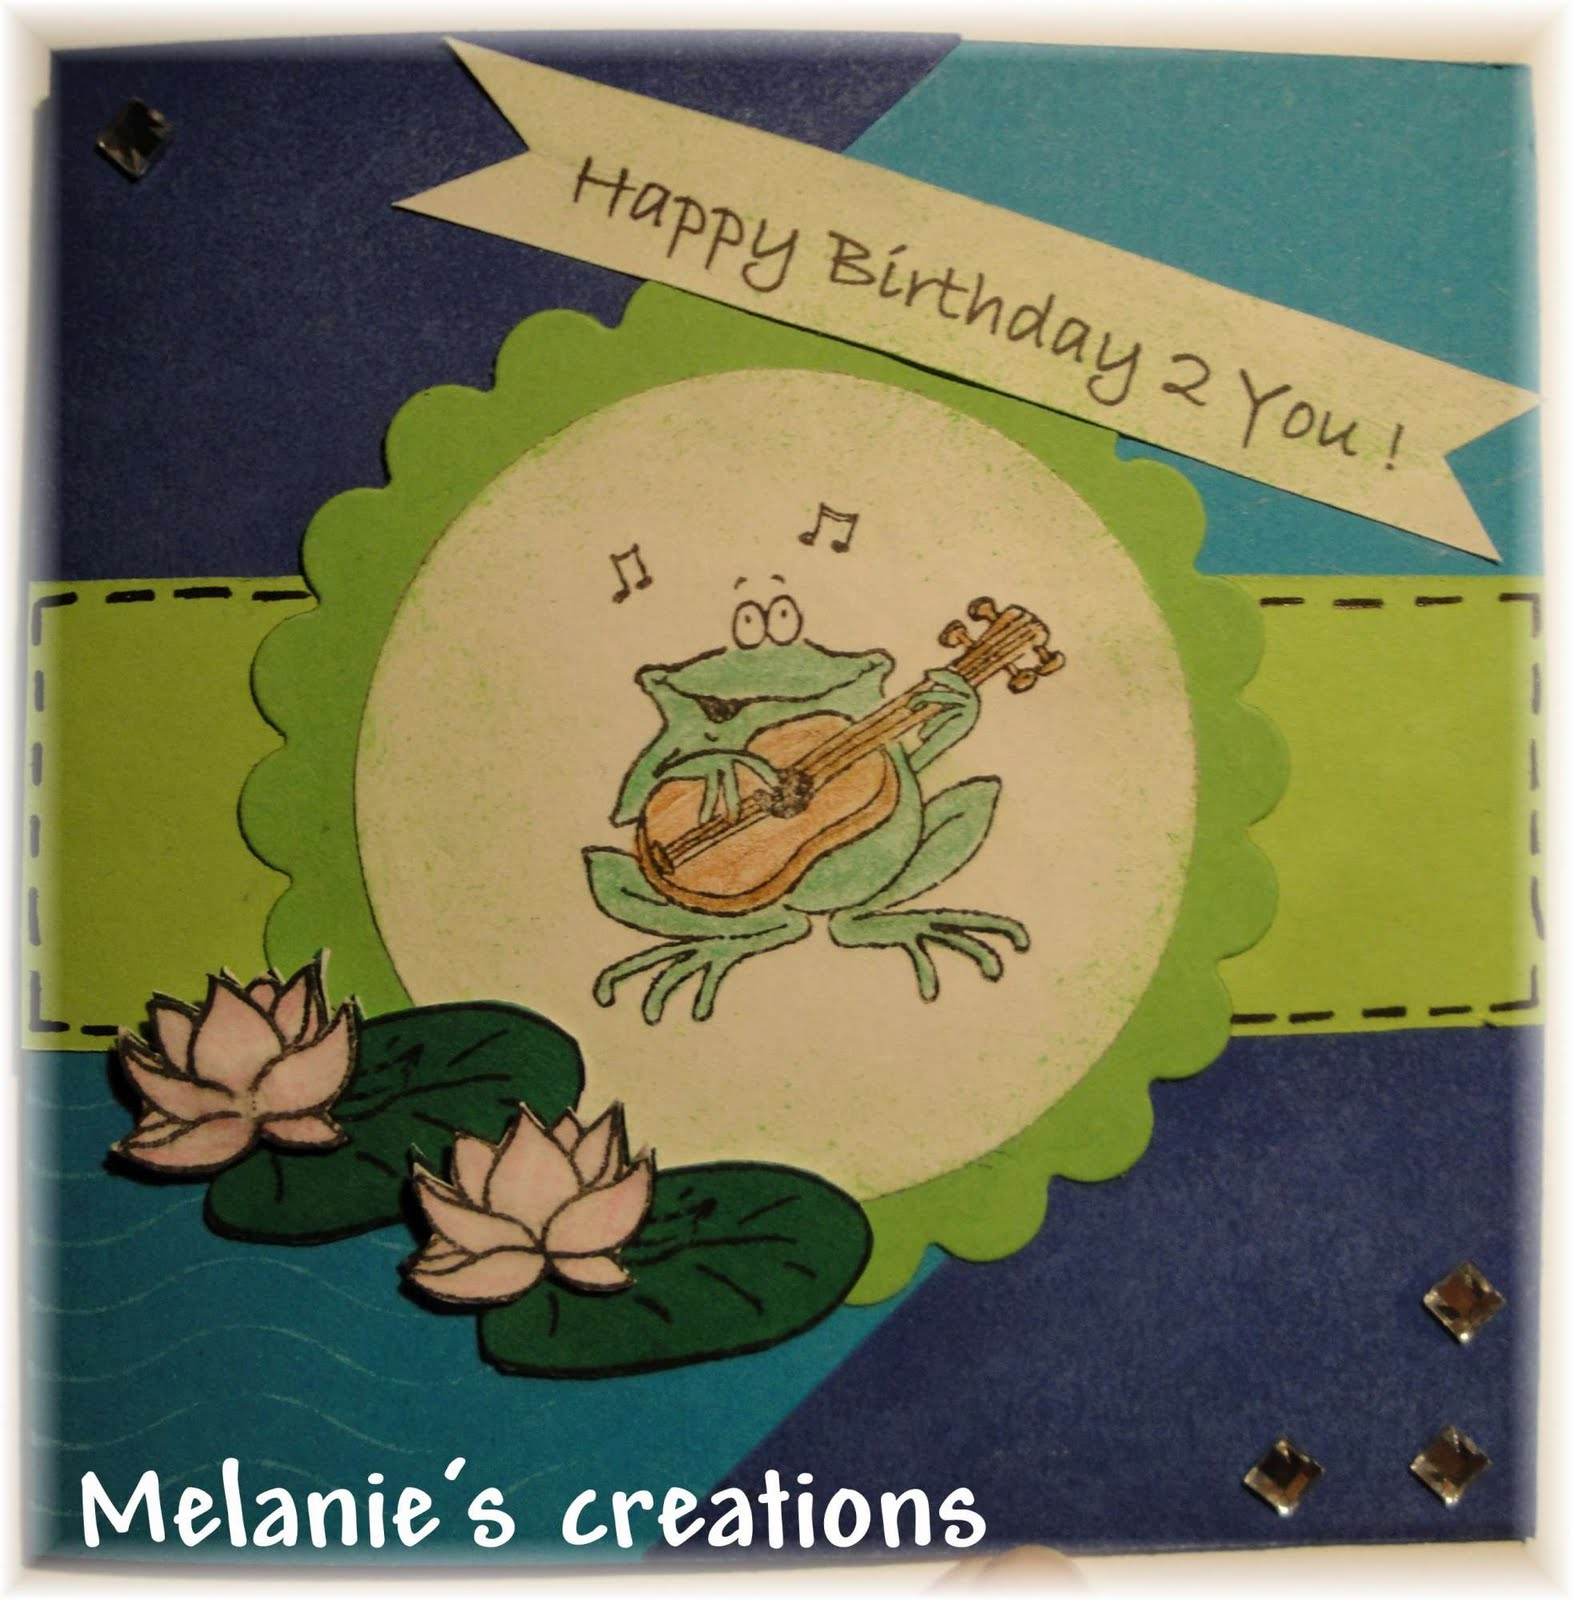 Melanie's Creative World: Happy Birthday 2 U